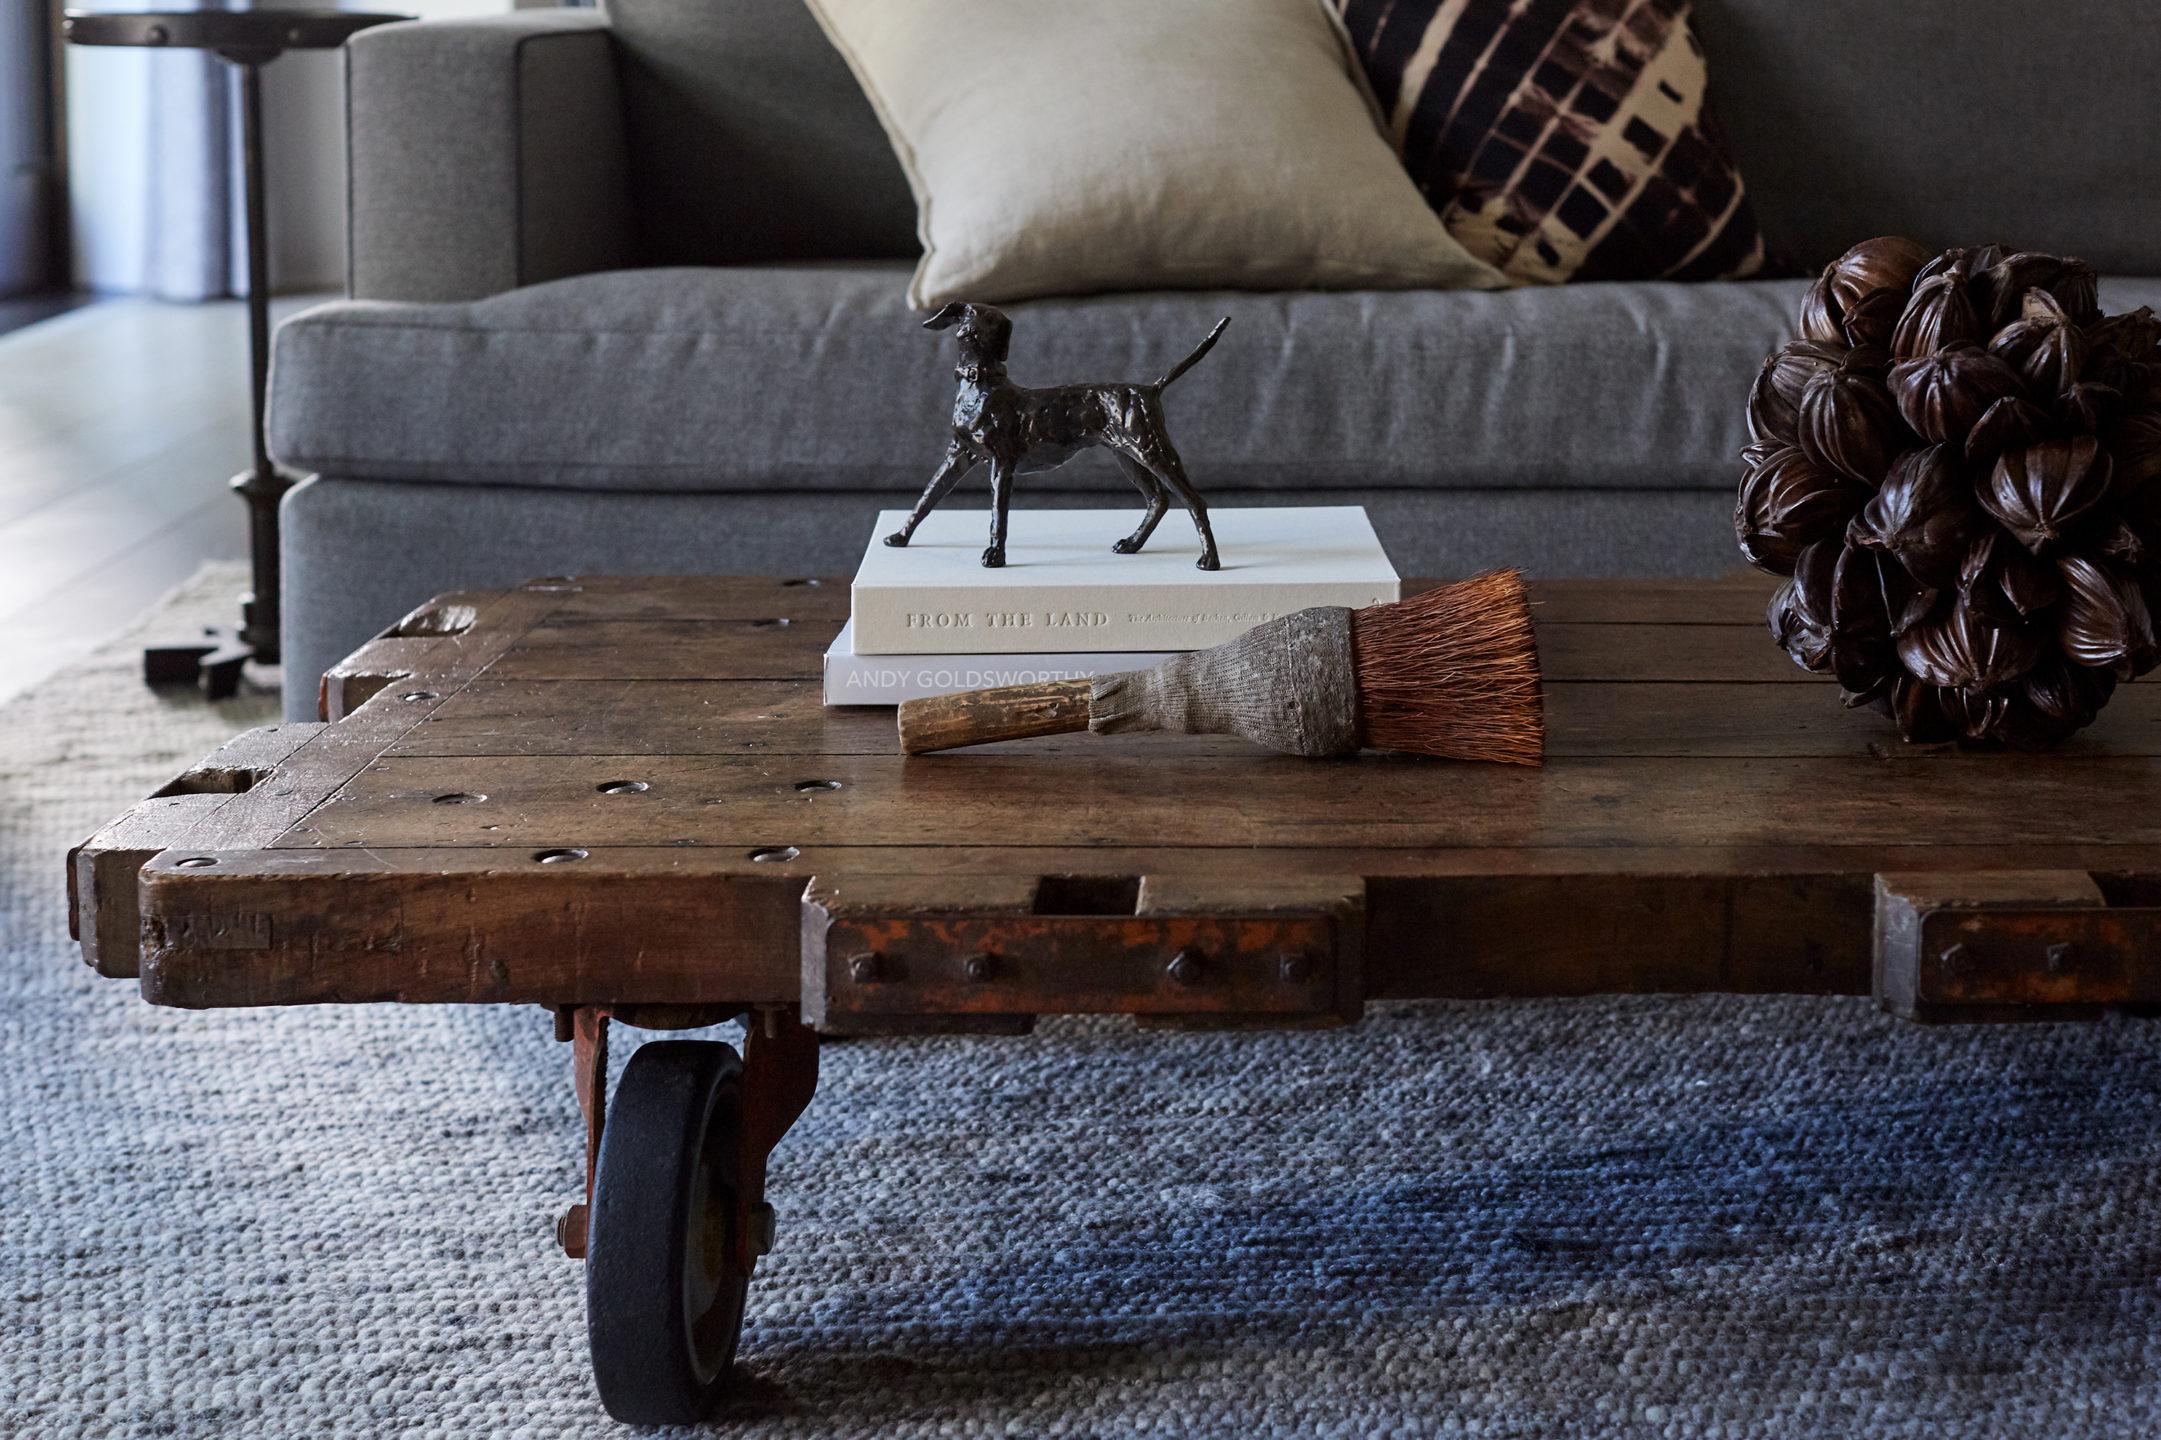 Jennifer_robins_interiors_projects_healdsburg_3_living_room_details_coffee_table